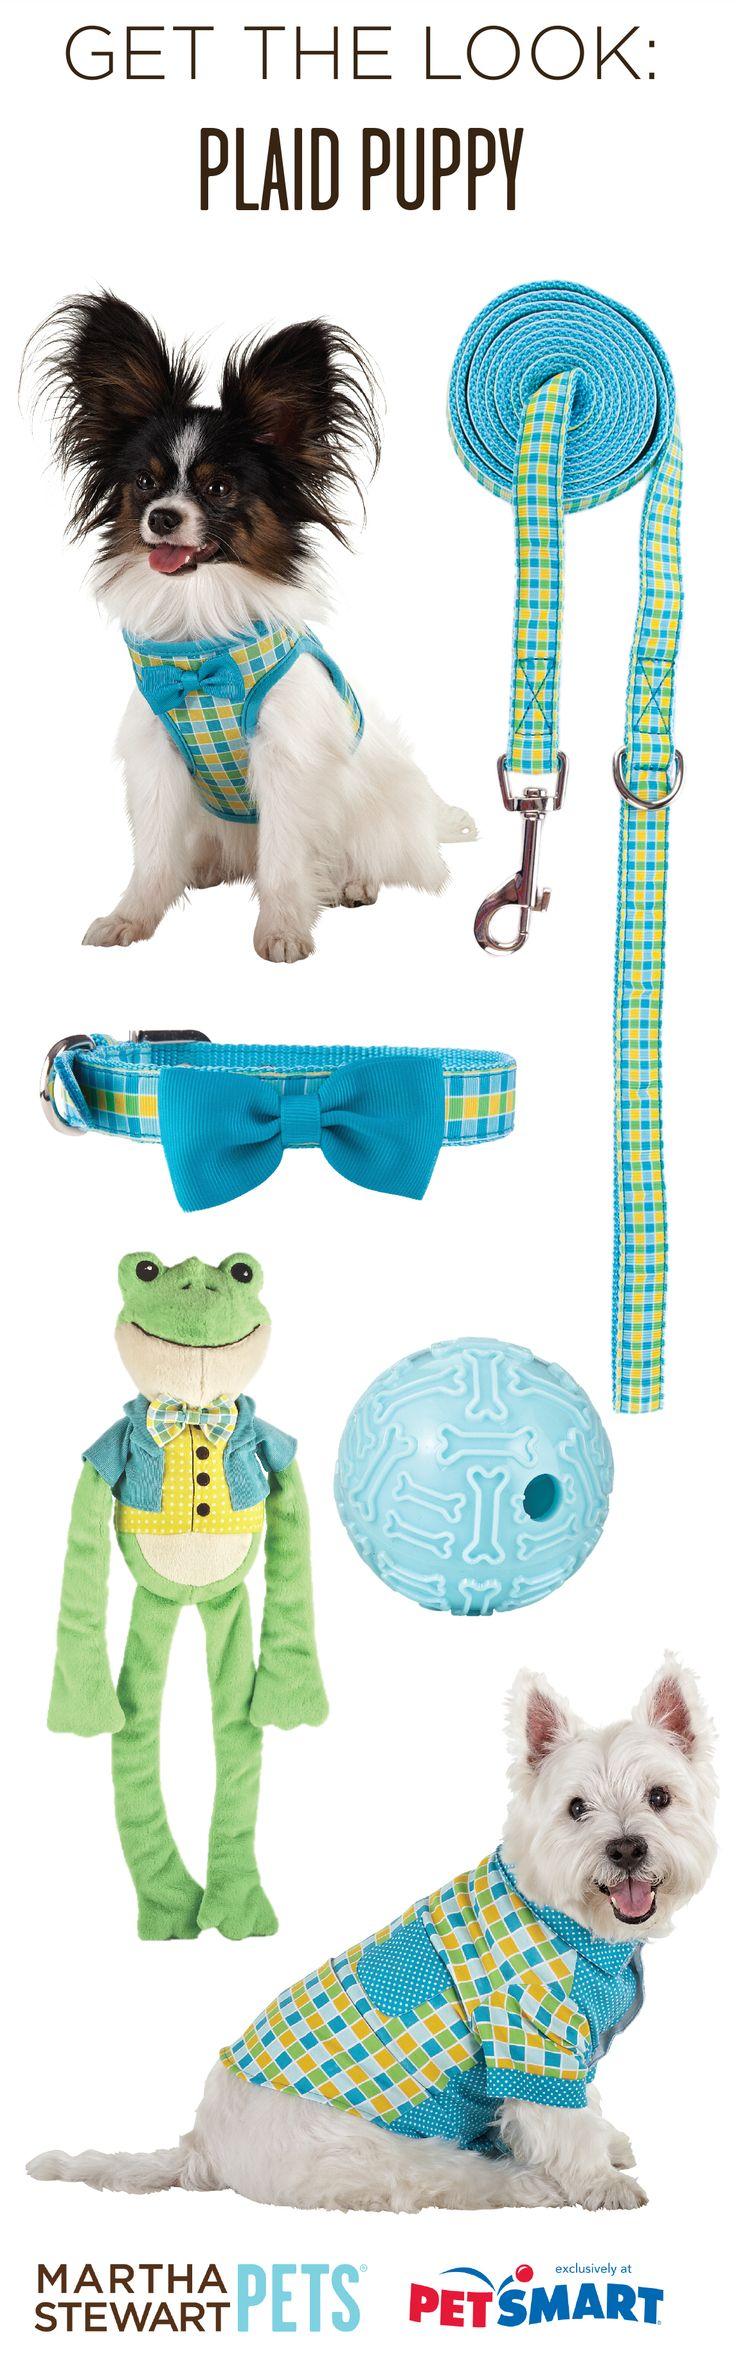 Get The Look: Plaid Puppy with #MarthaStewartPets at #PetSmart! #preppy